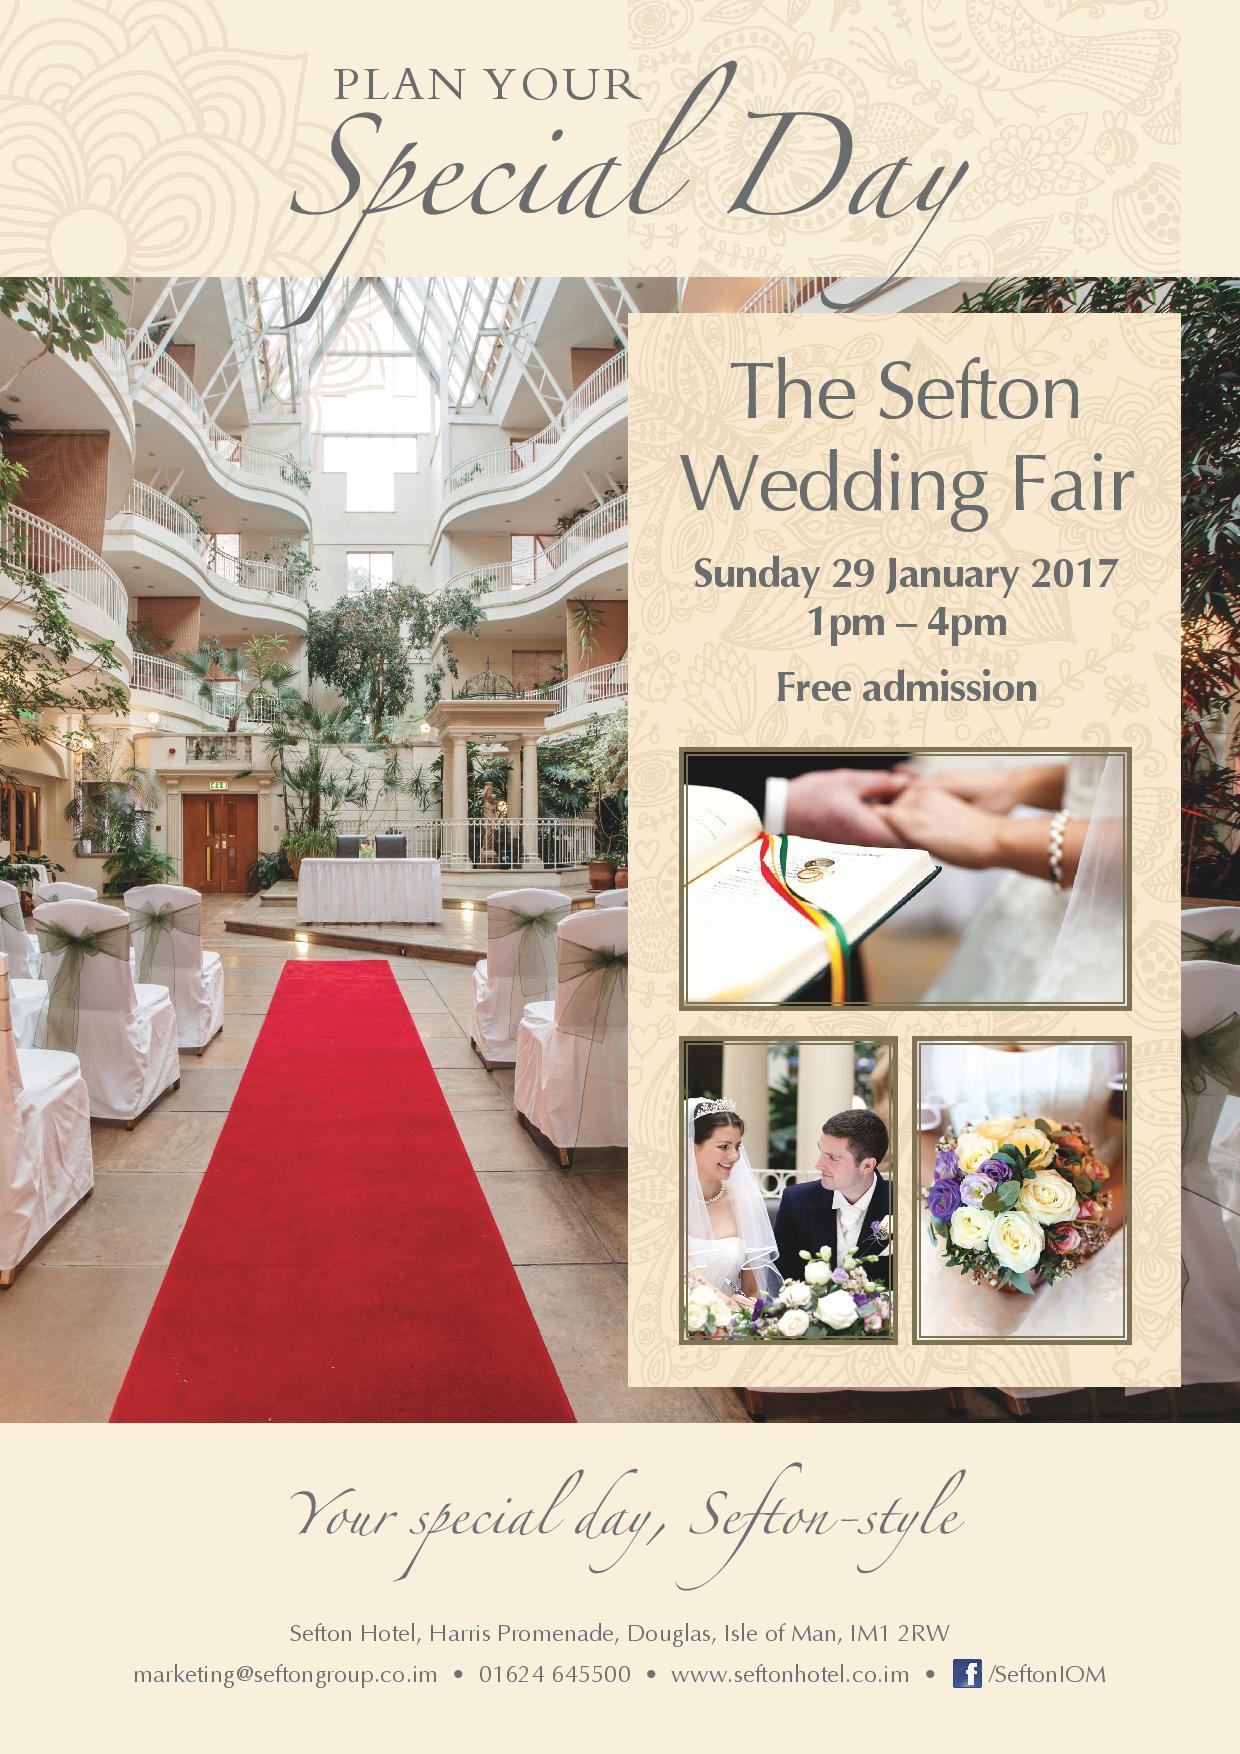 The Sefton Wedding Fair